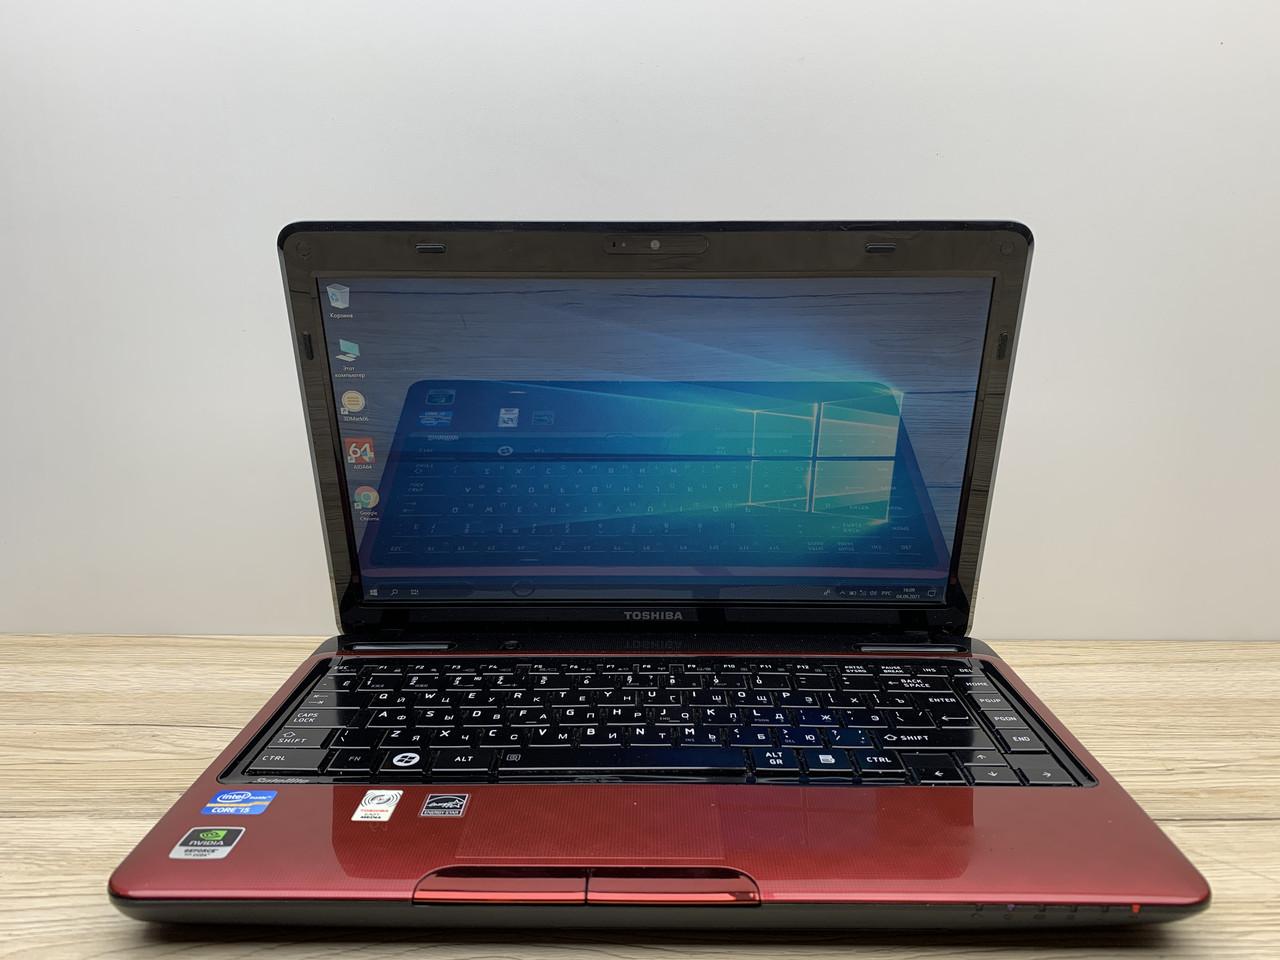 Ноутбук Б/У Toshiba L735-11F 13.3HD/ i5-2410m 2(4) 2.9GHz/ GF315M 1Gb/ RAM 4Gb/ SSD 120Gb/ АКБ 47Wh/ Сост. 8